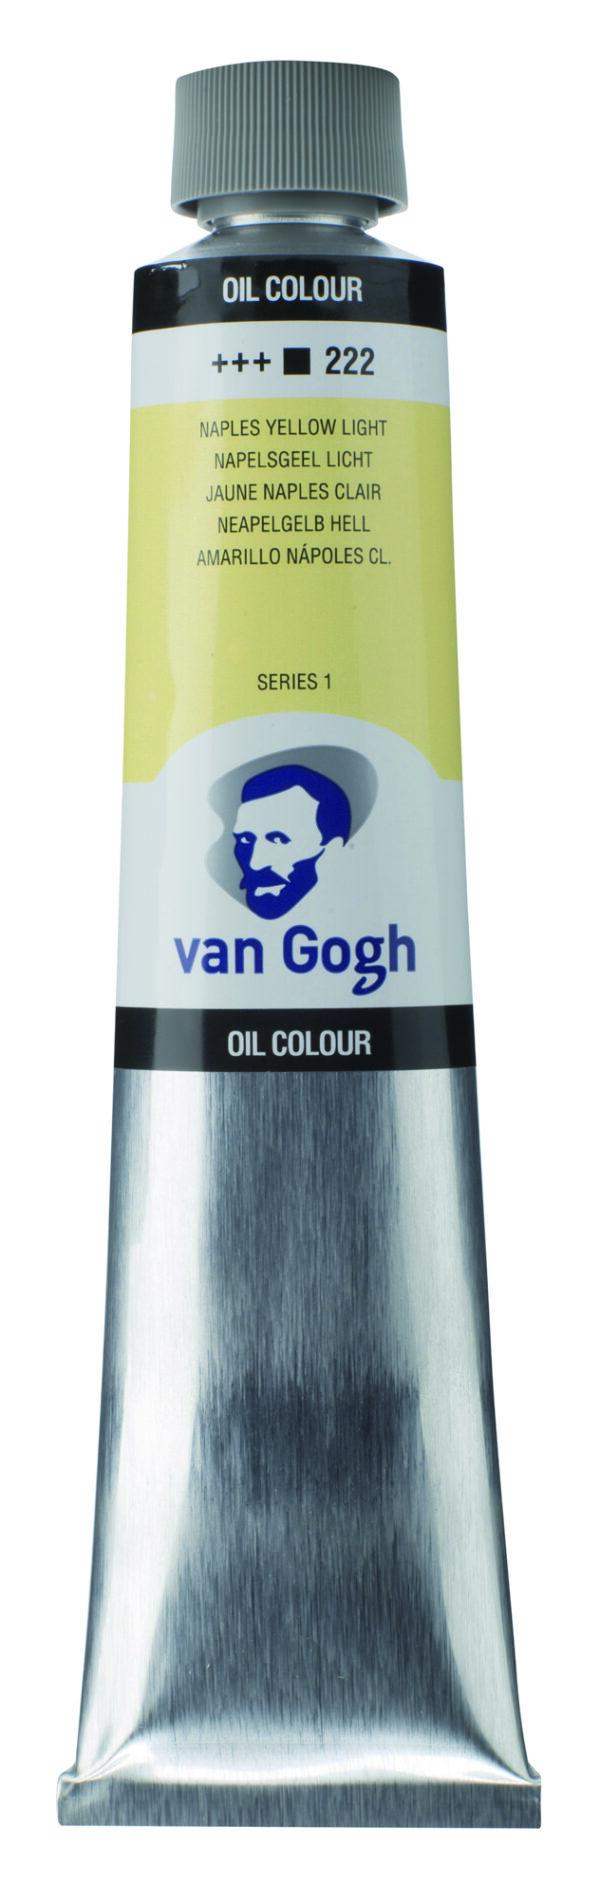 Van Gogh 222 Naples yellow Light - 200 ml